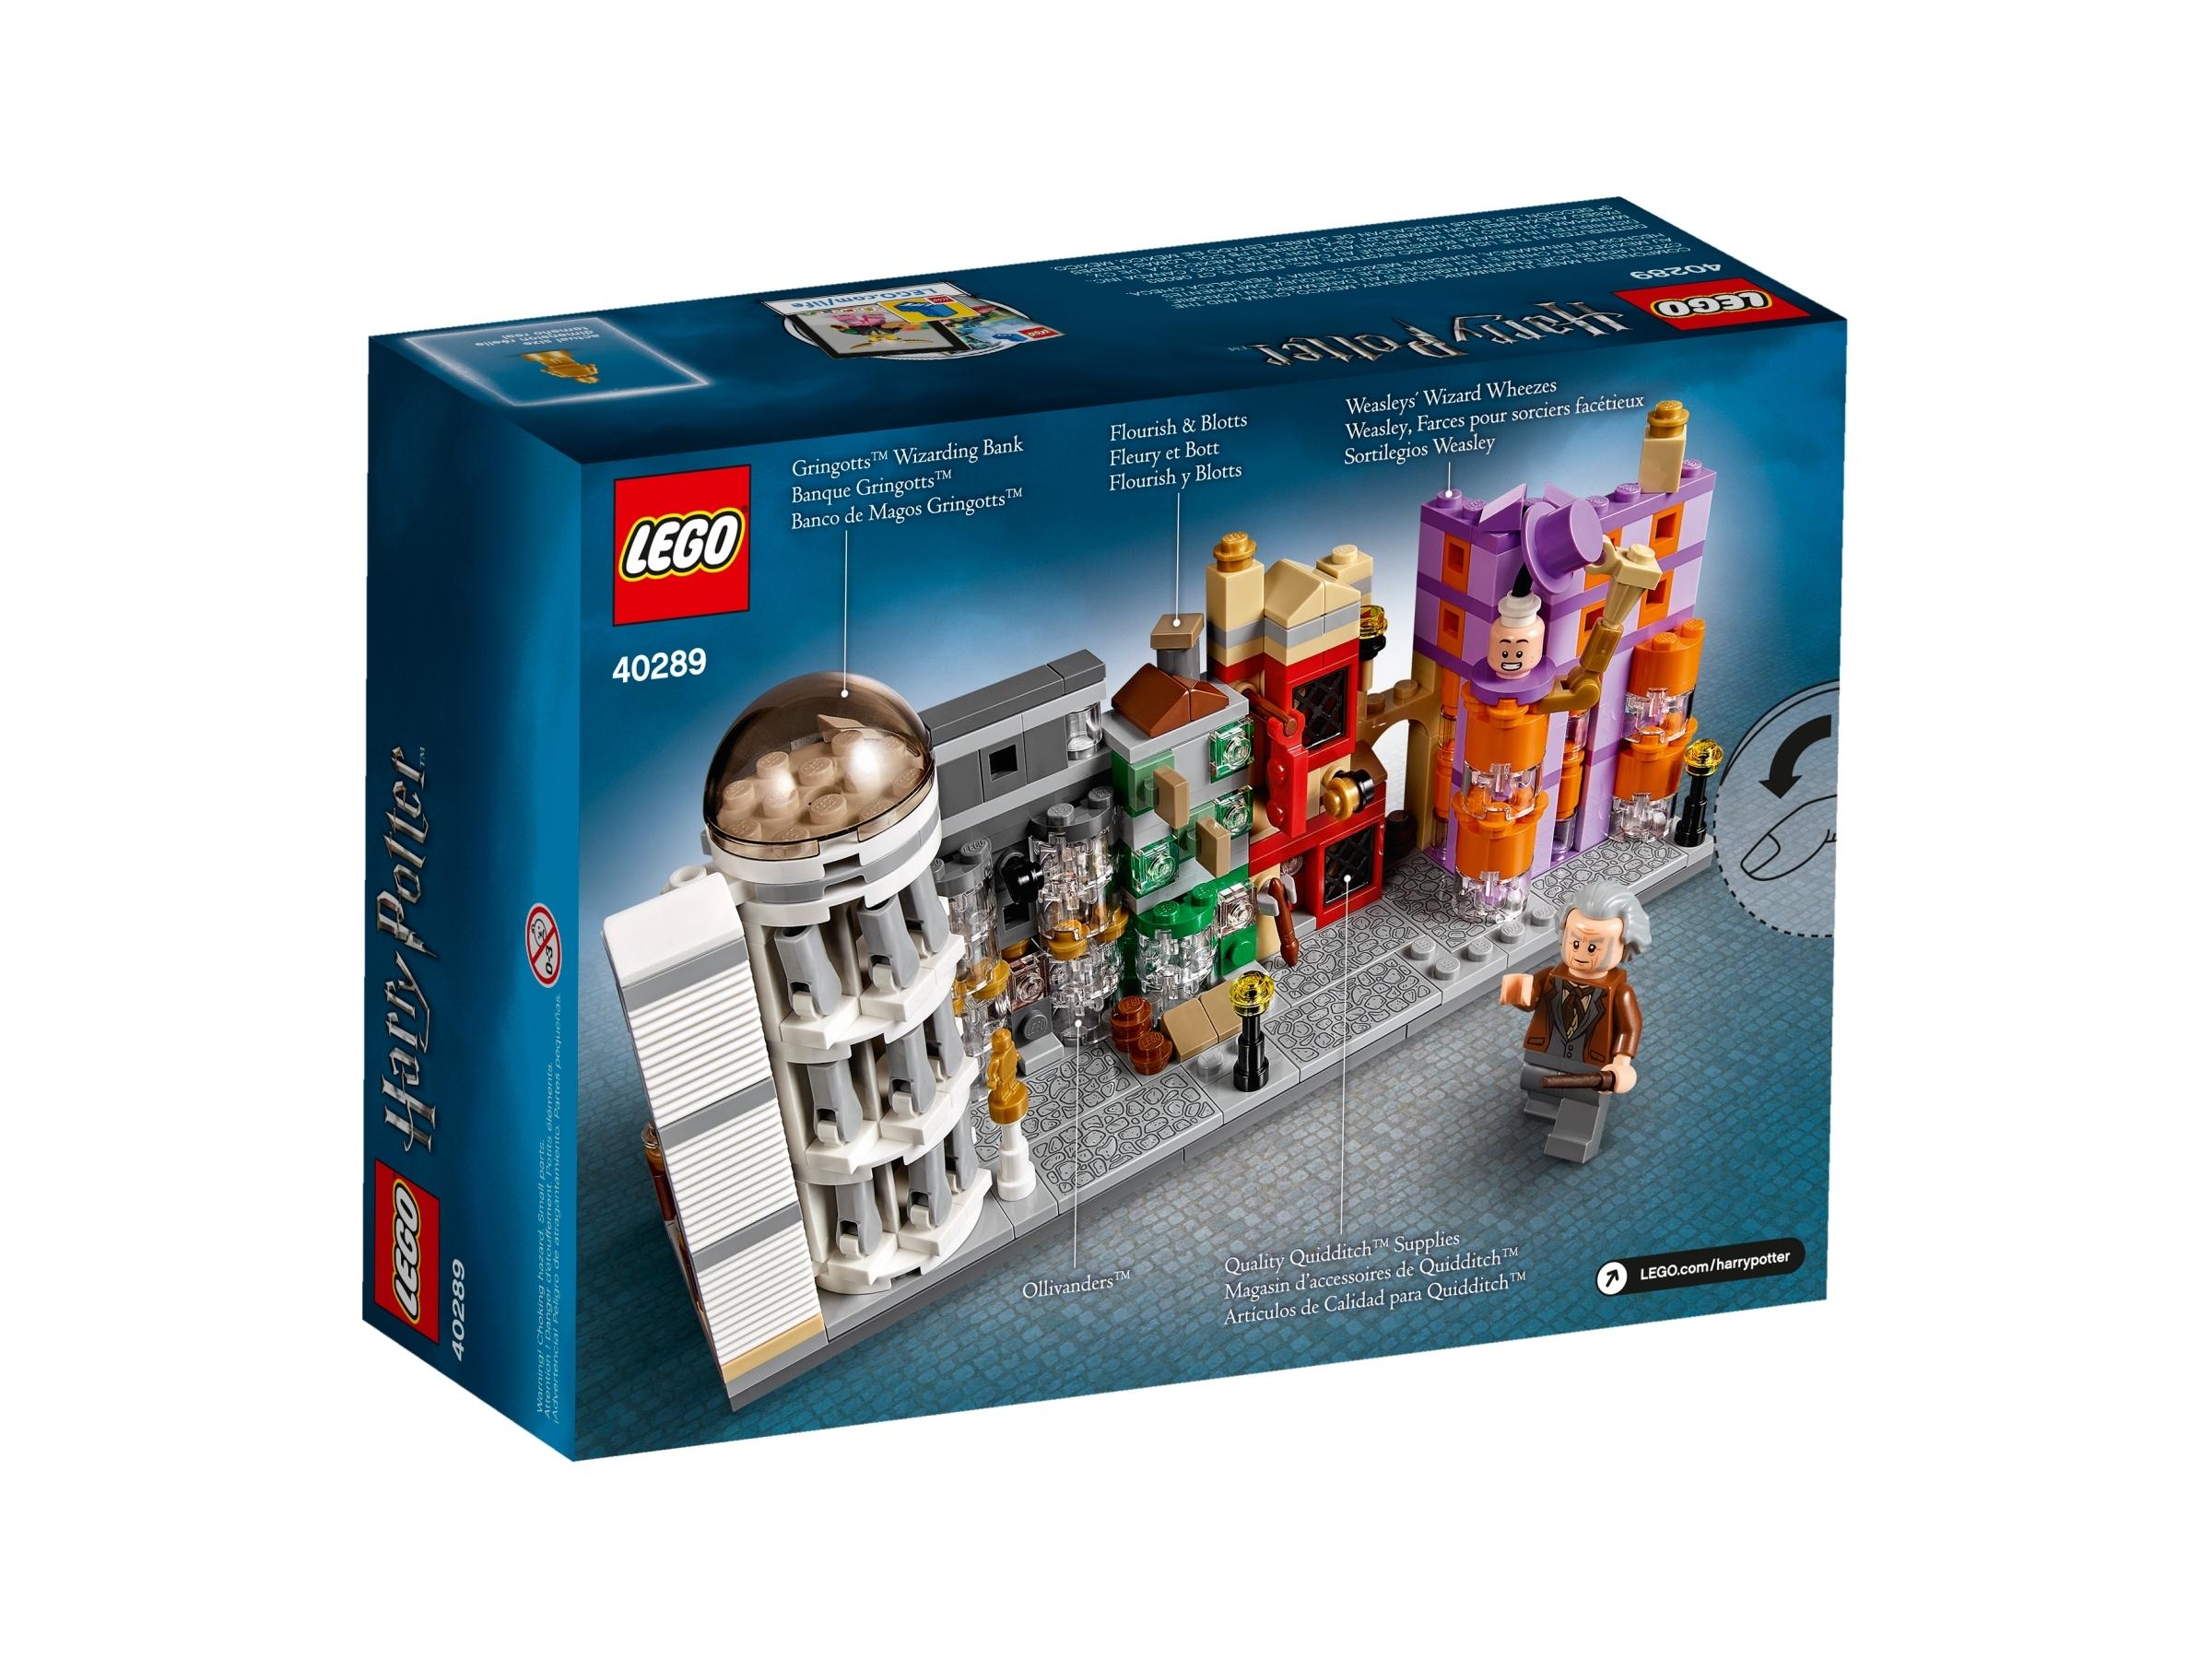 new, sealed #40289 LEGO Harry Potter Diagon Alley set